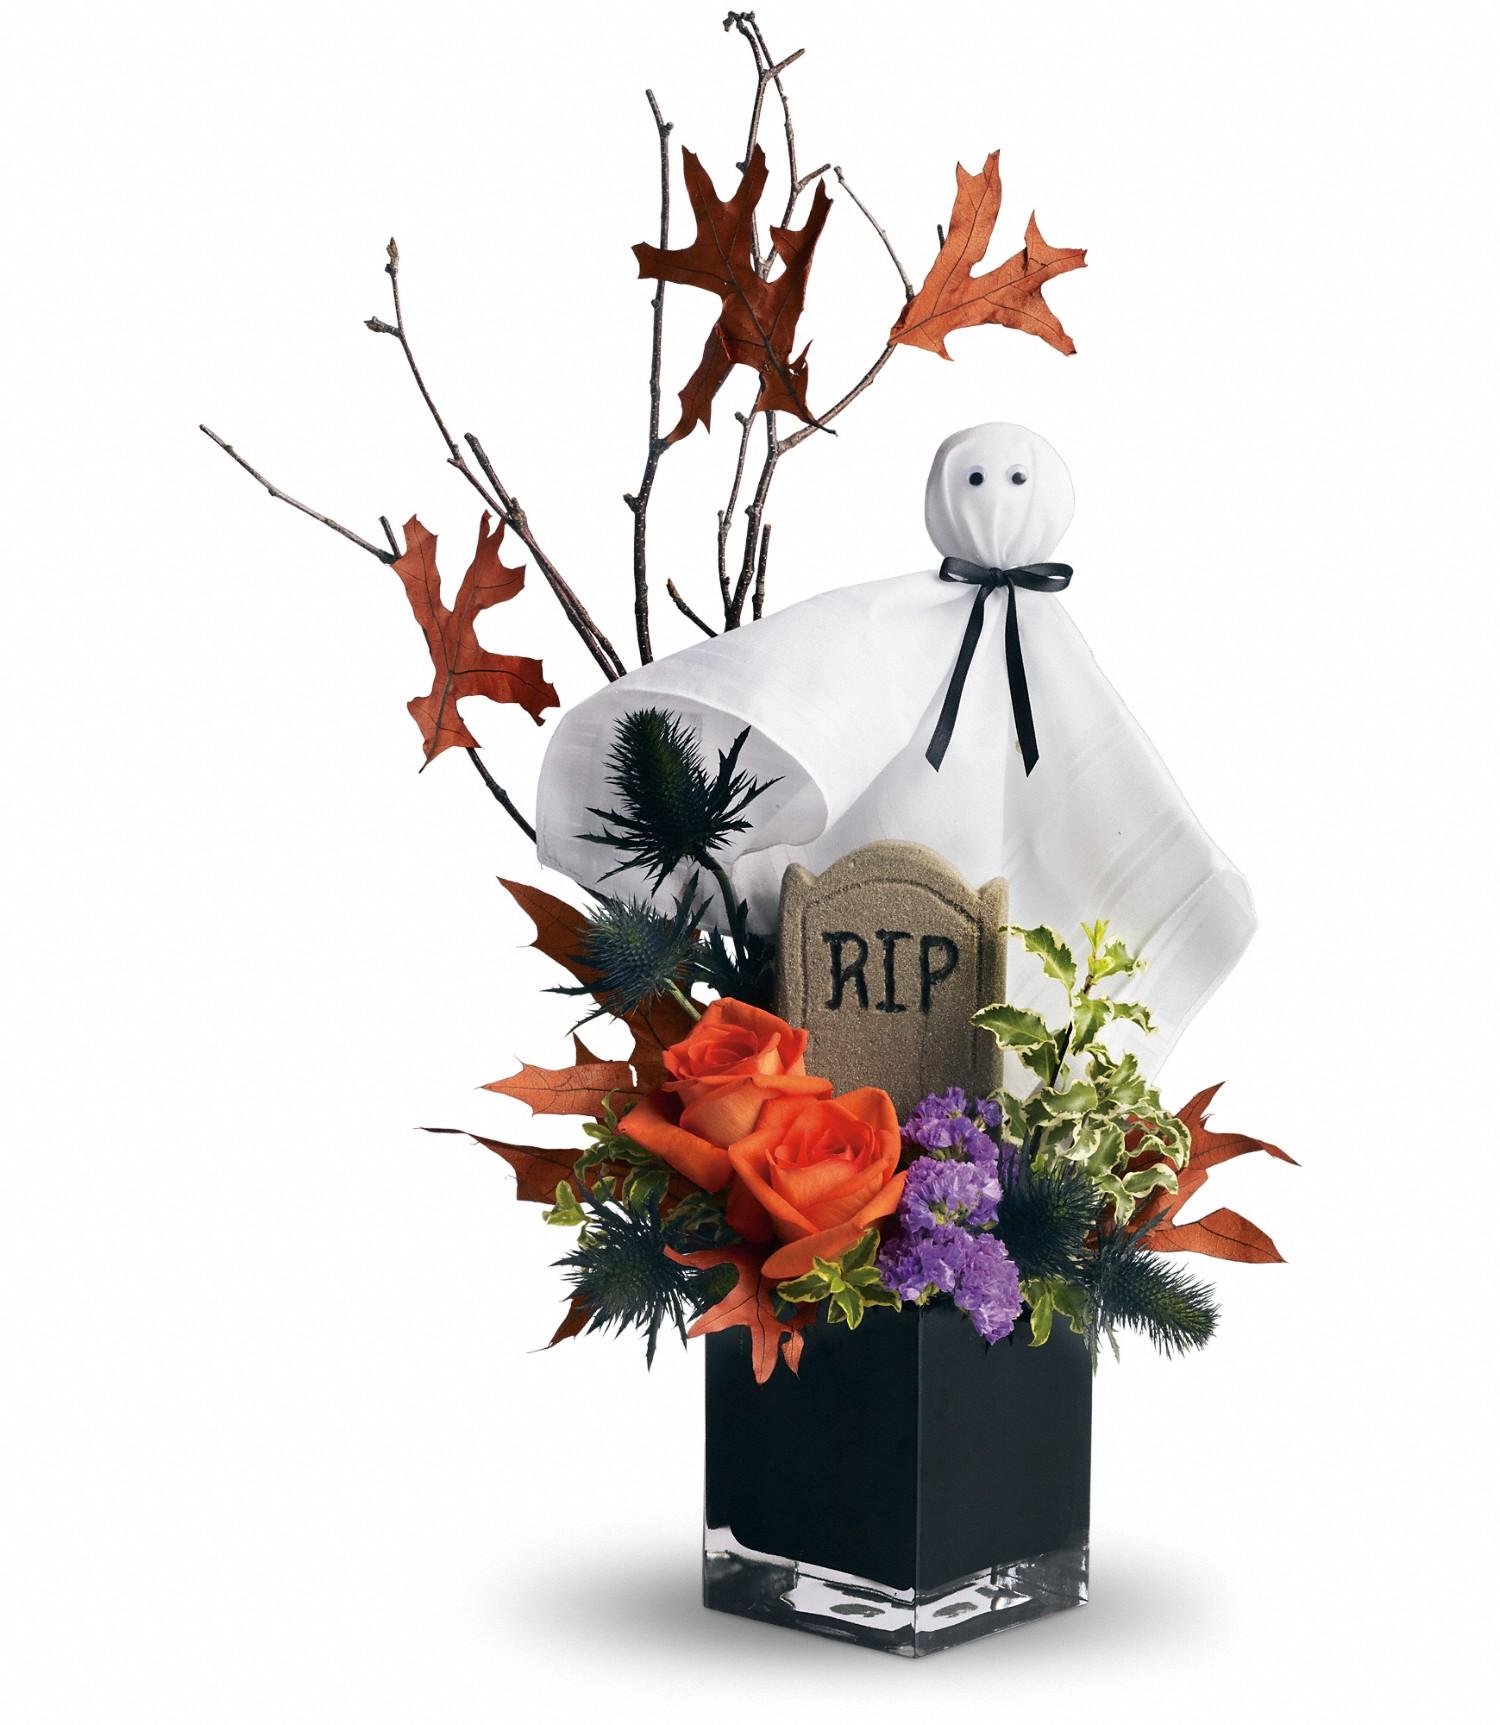 Halloween Bouquets From Your Favorite Florist In Pasadena Texas Enchanted Florist Pasadena